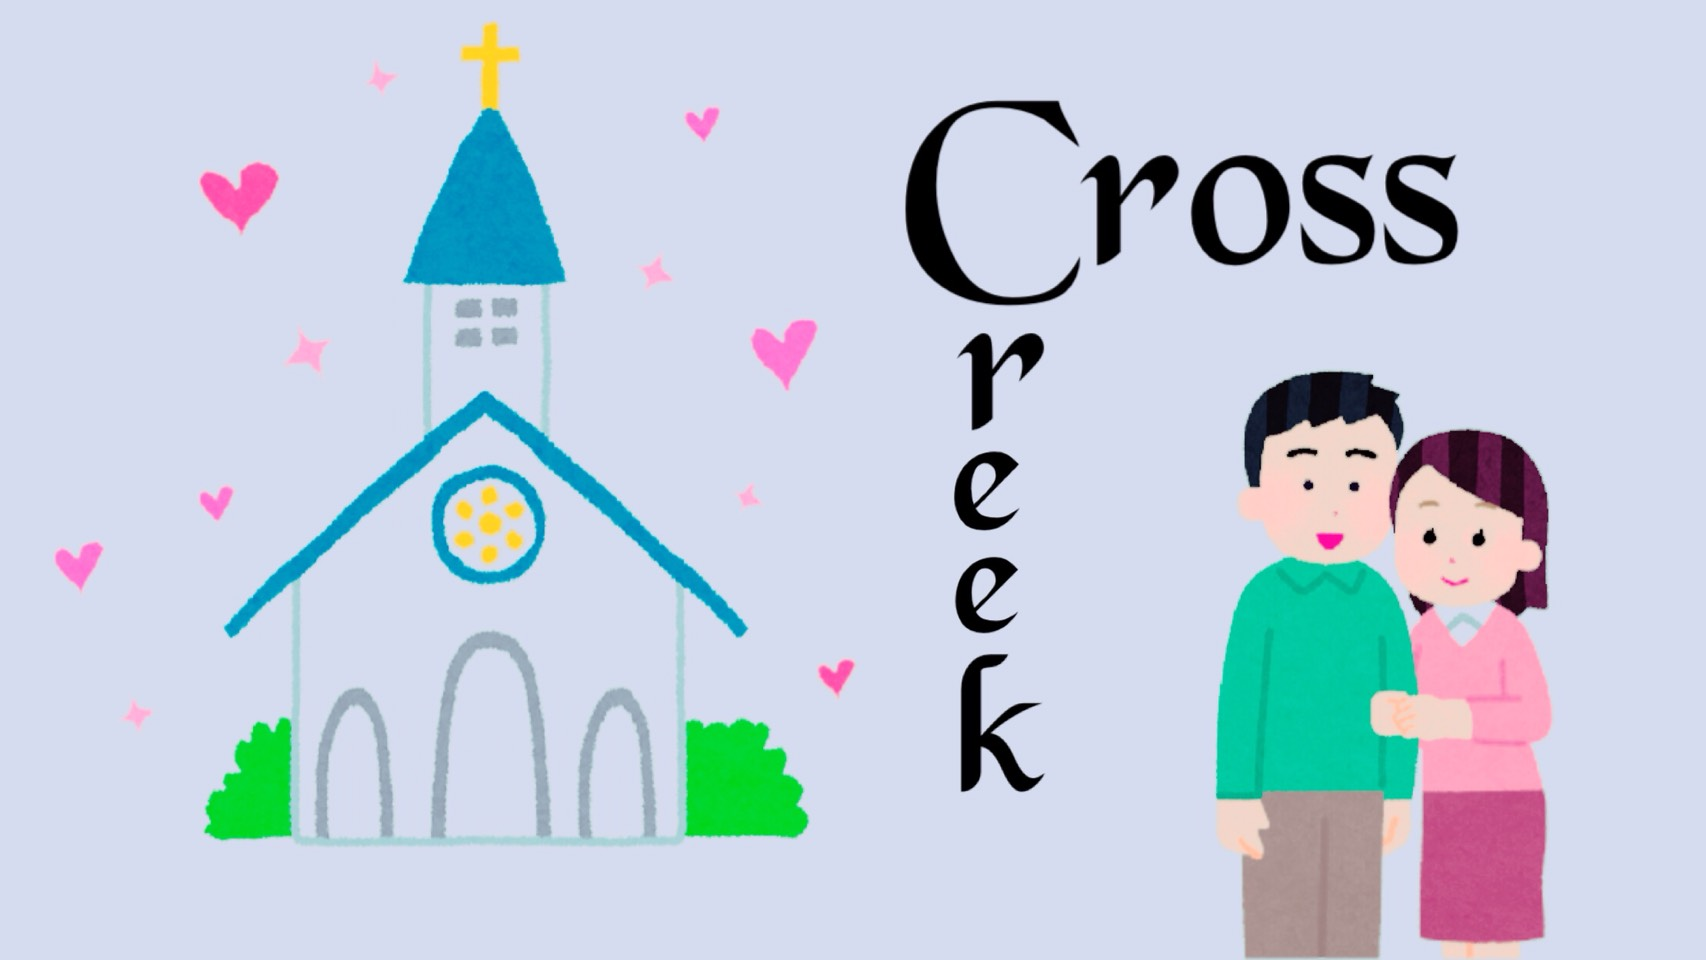 「Cross Creek」のイメージ